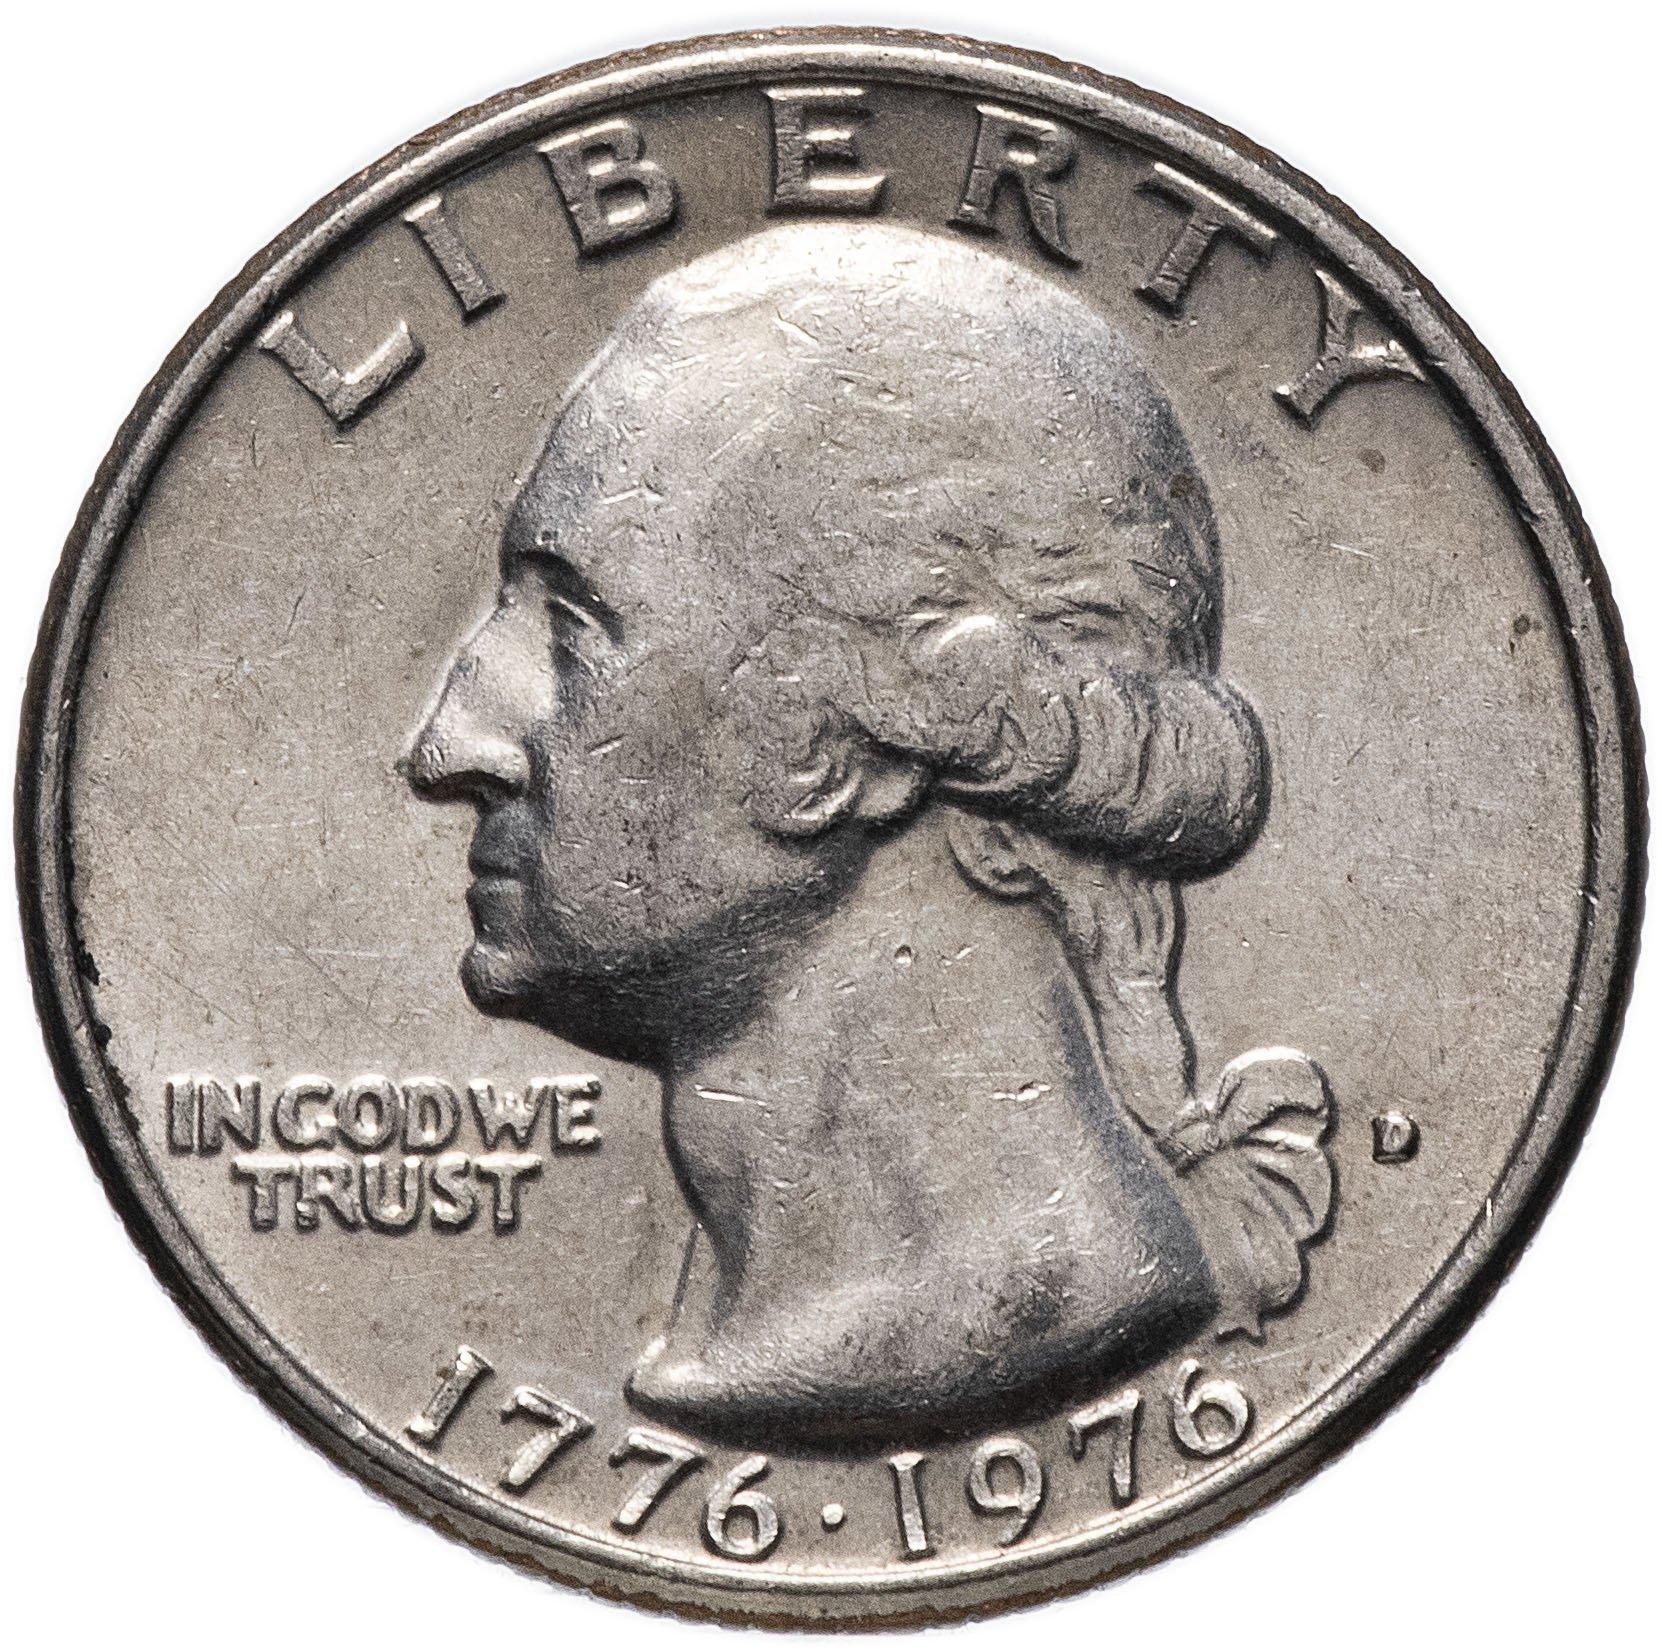 американские монеты фото нужно